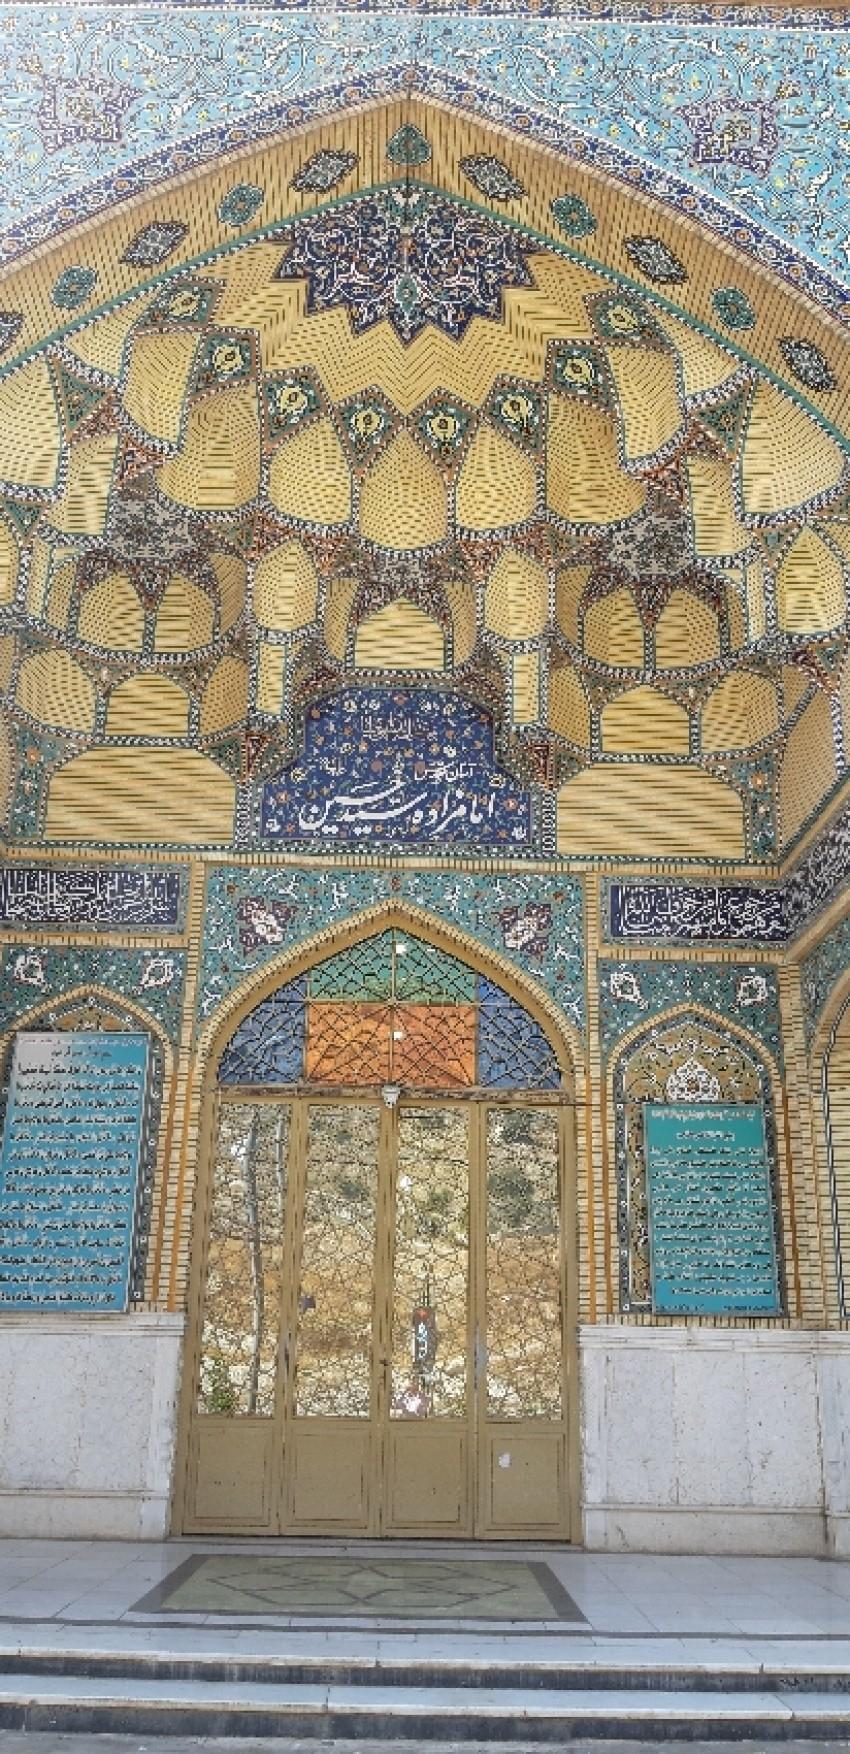 Imamzadeh Seyed Hossein (1).jpeg